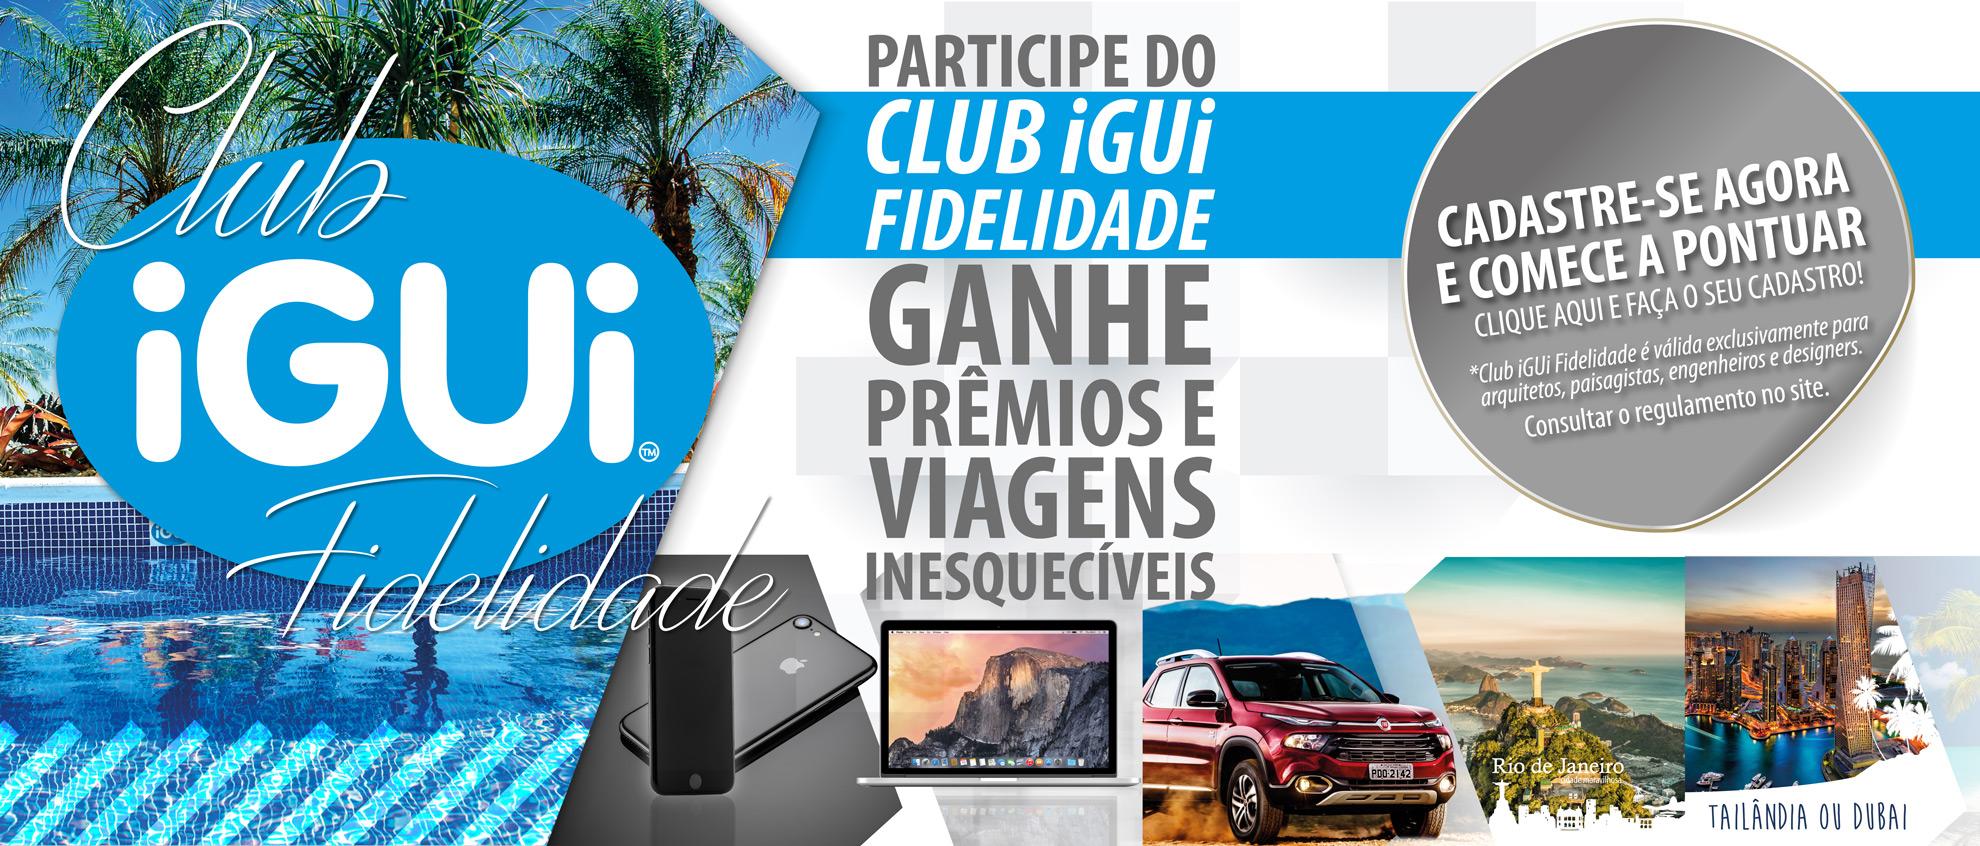 slider-club-igui-fidelidade-1-1920x846